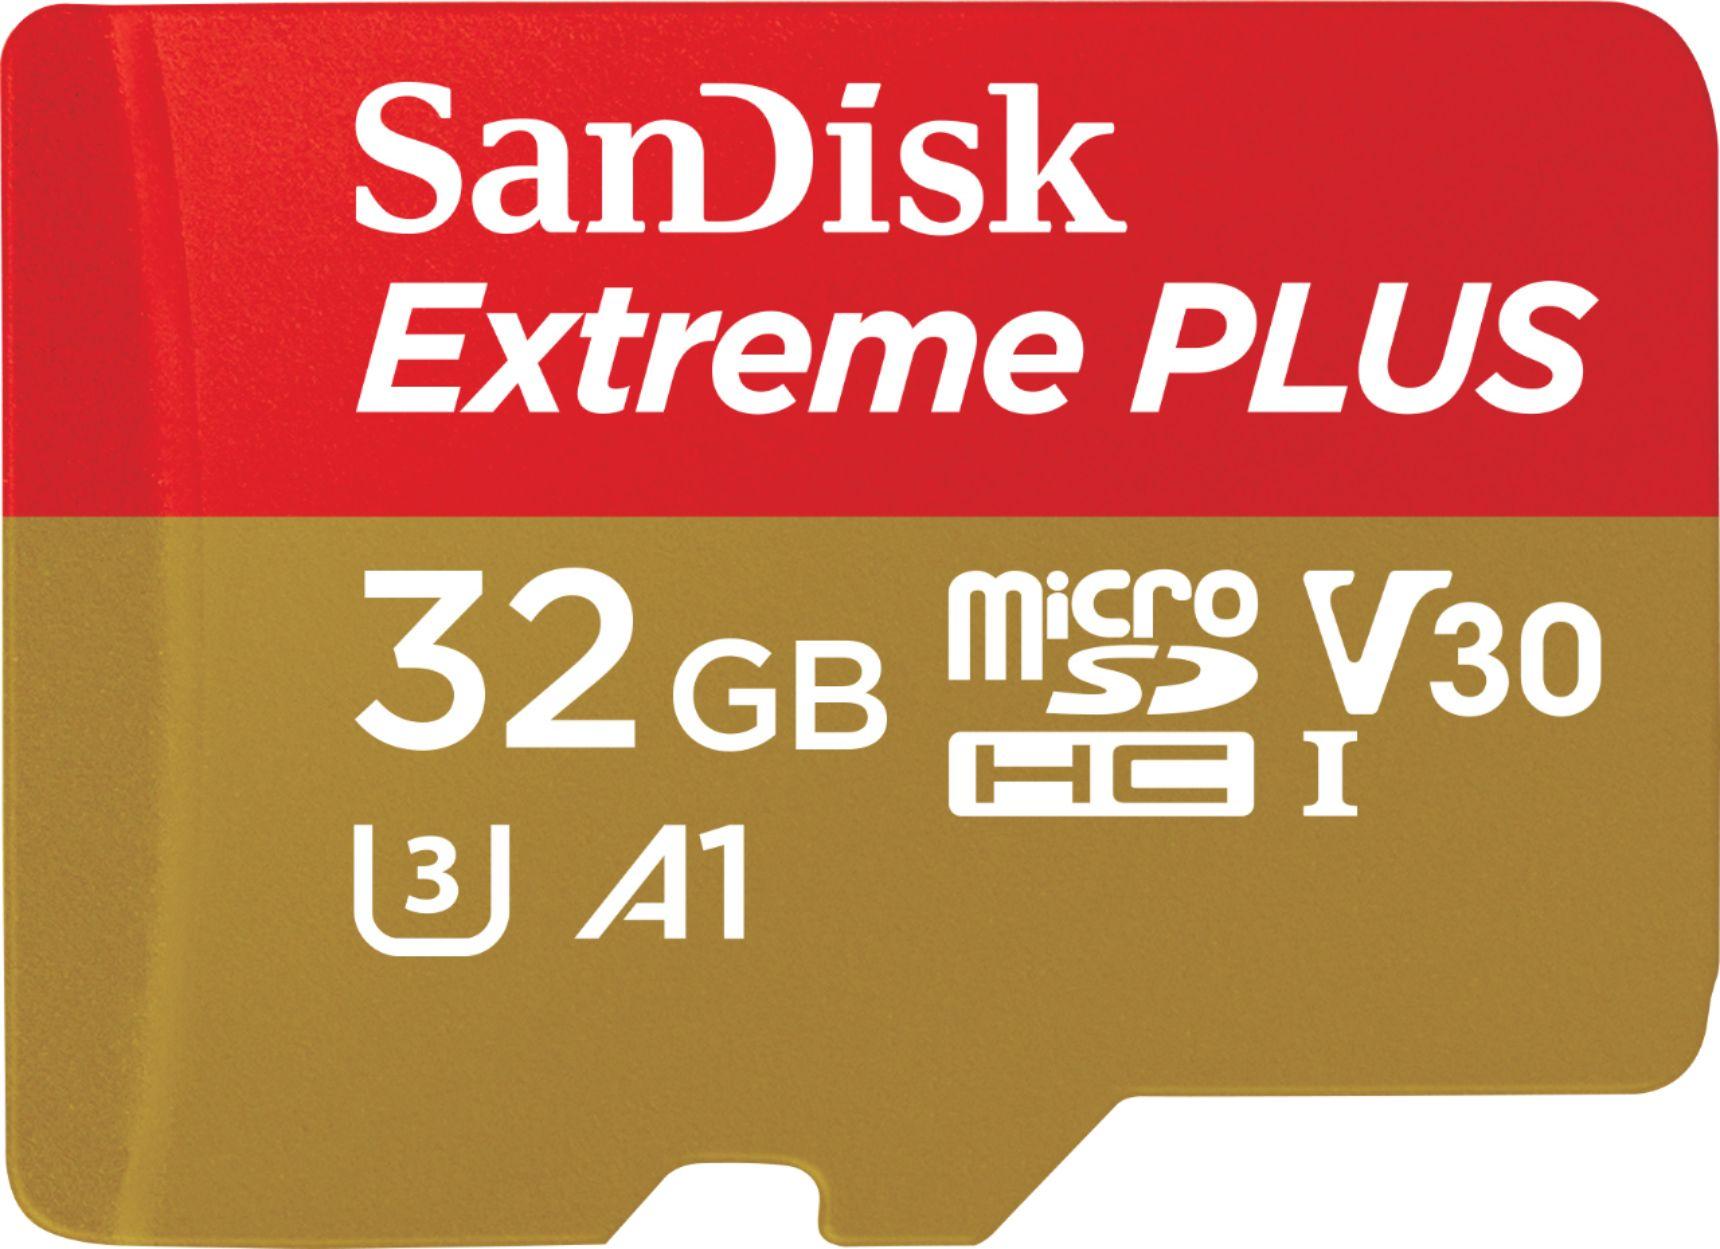 SanDisk - Extreme PLUS 32GB microSDHC UHS-I Memory Card